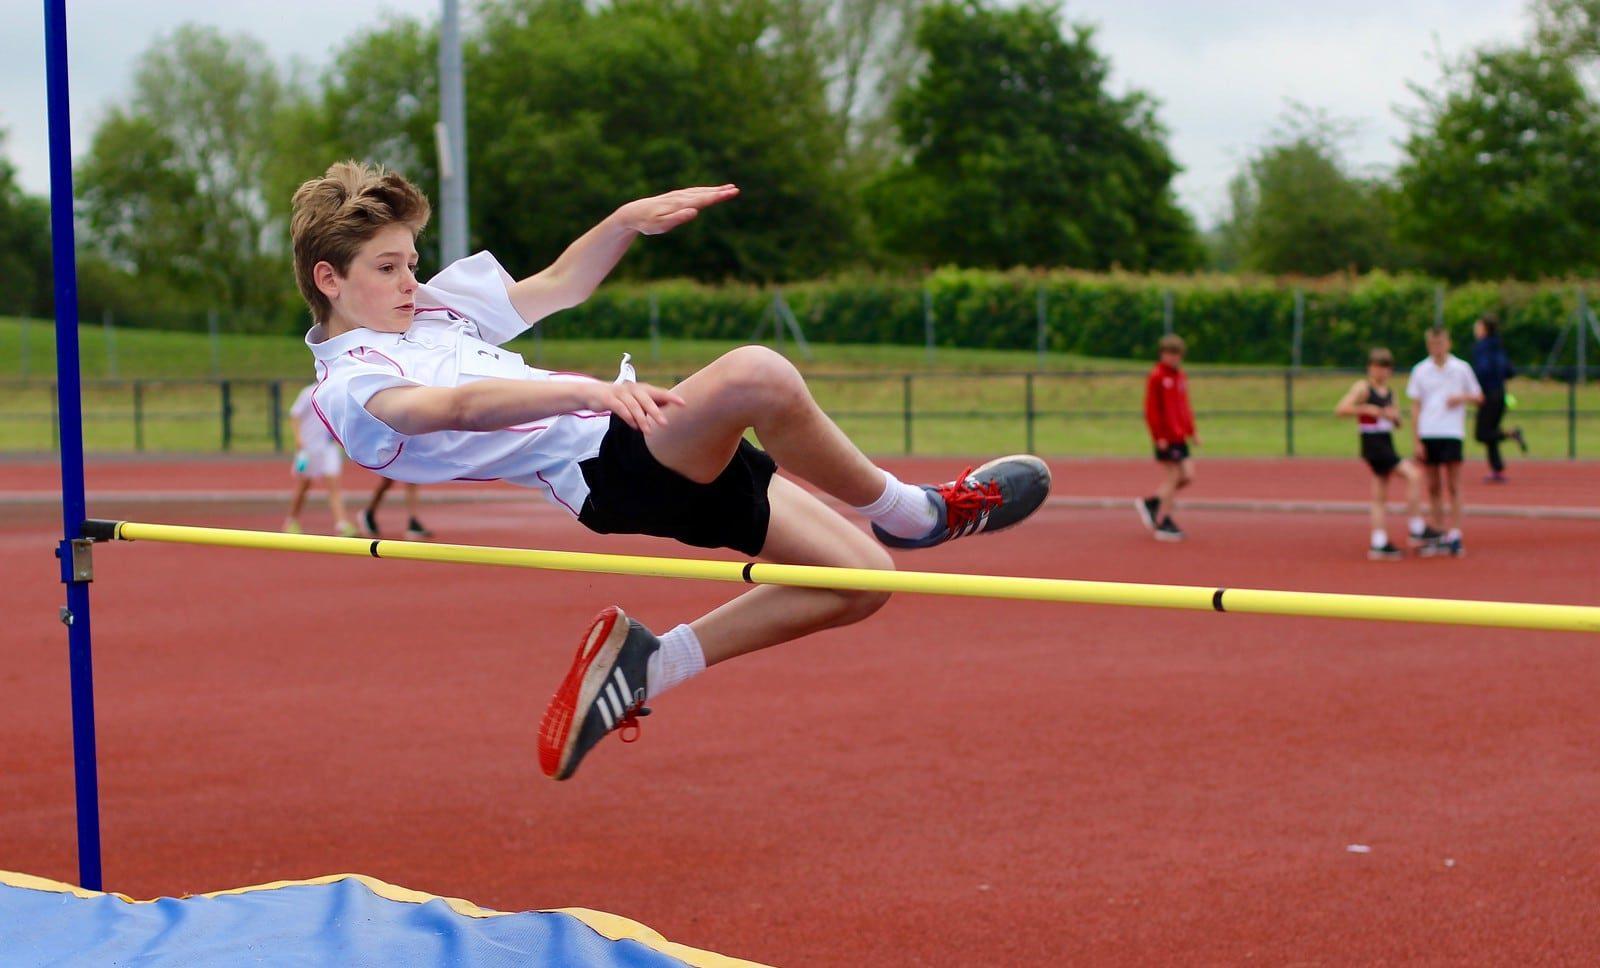 Abingdon School Sports Scholarships